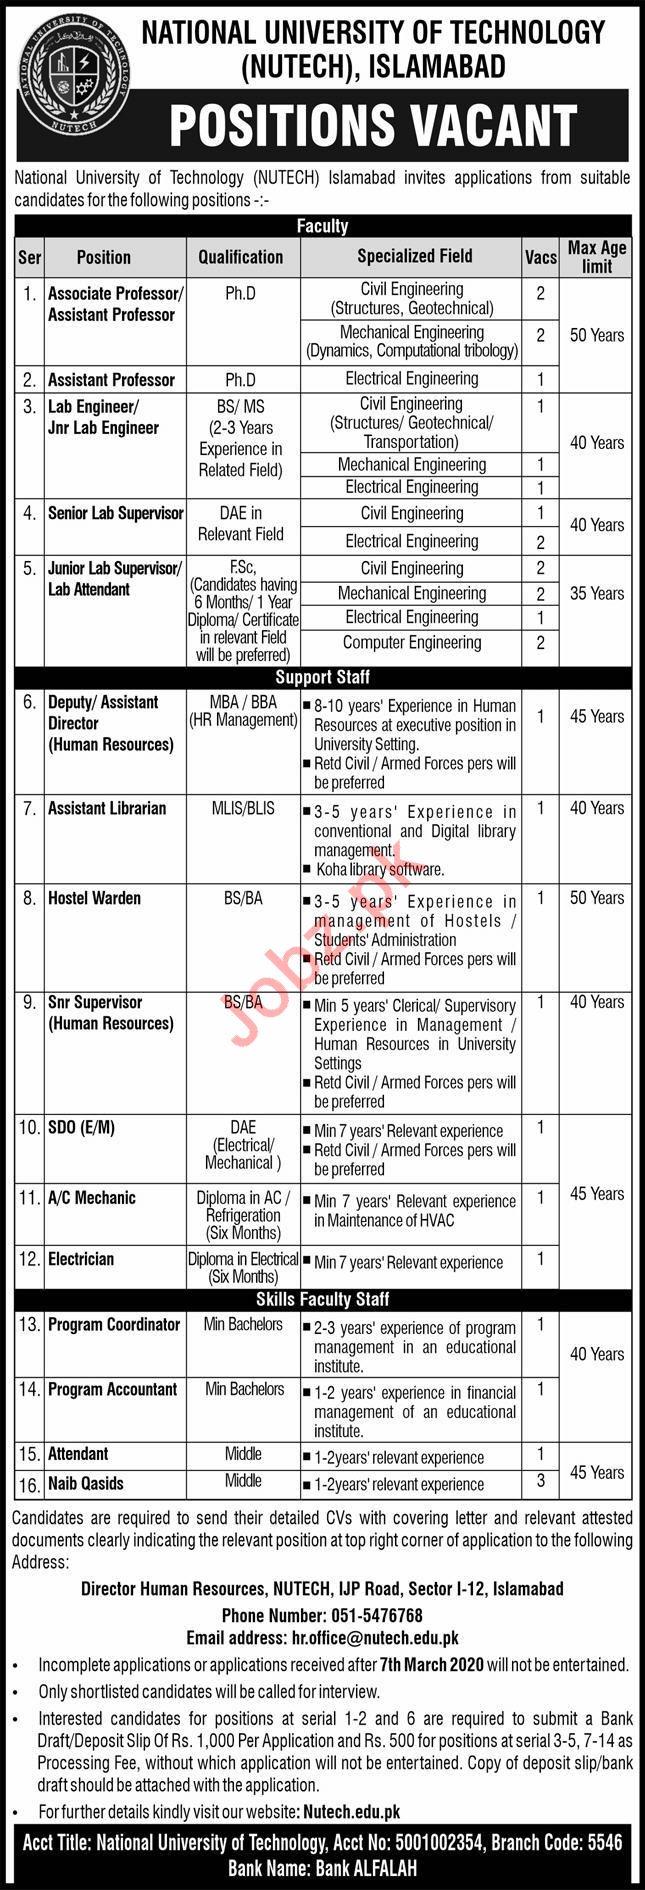 NUTECH University Islamabad Faculty & Non Faculty Jobs 2020